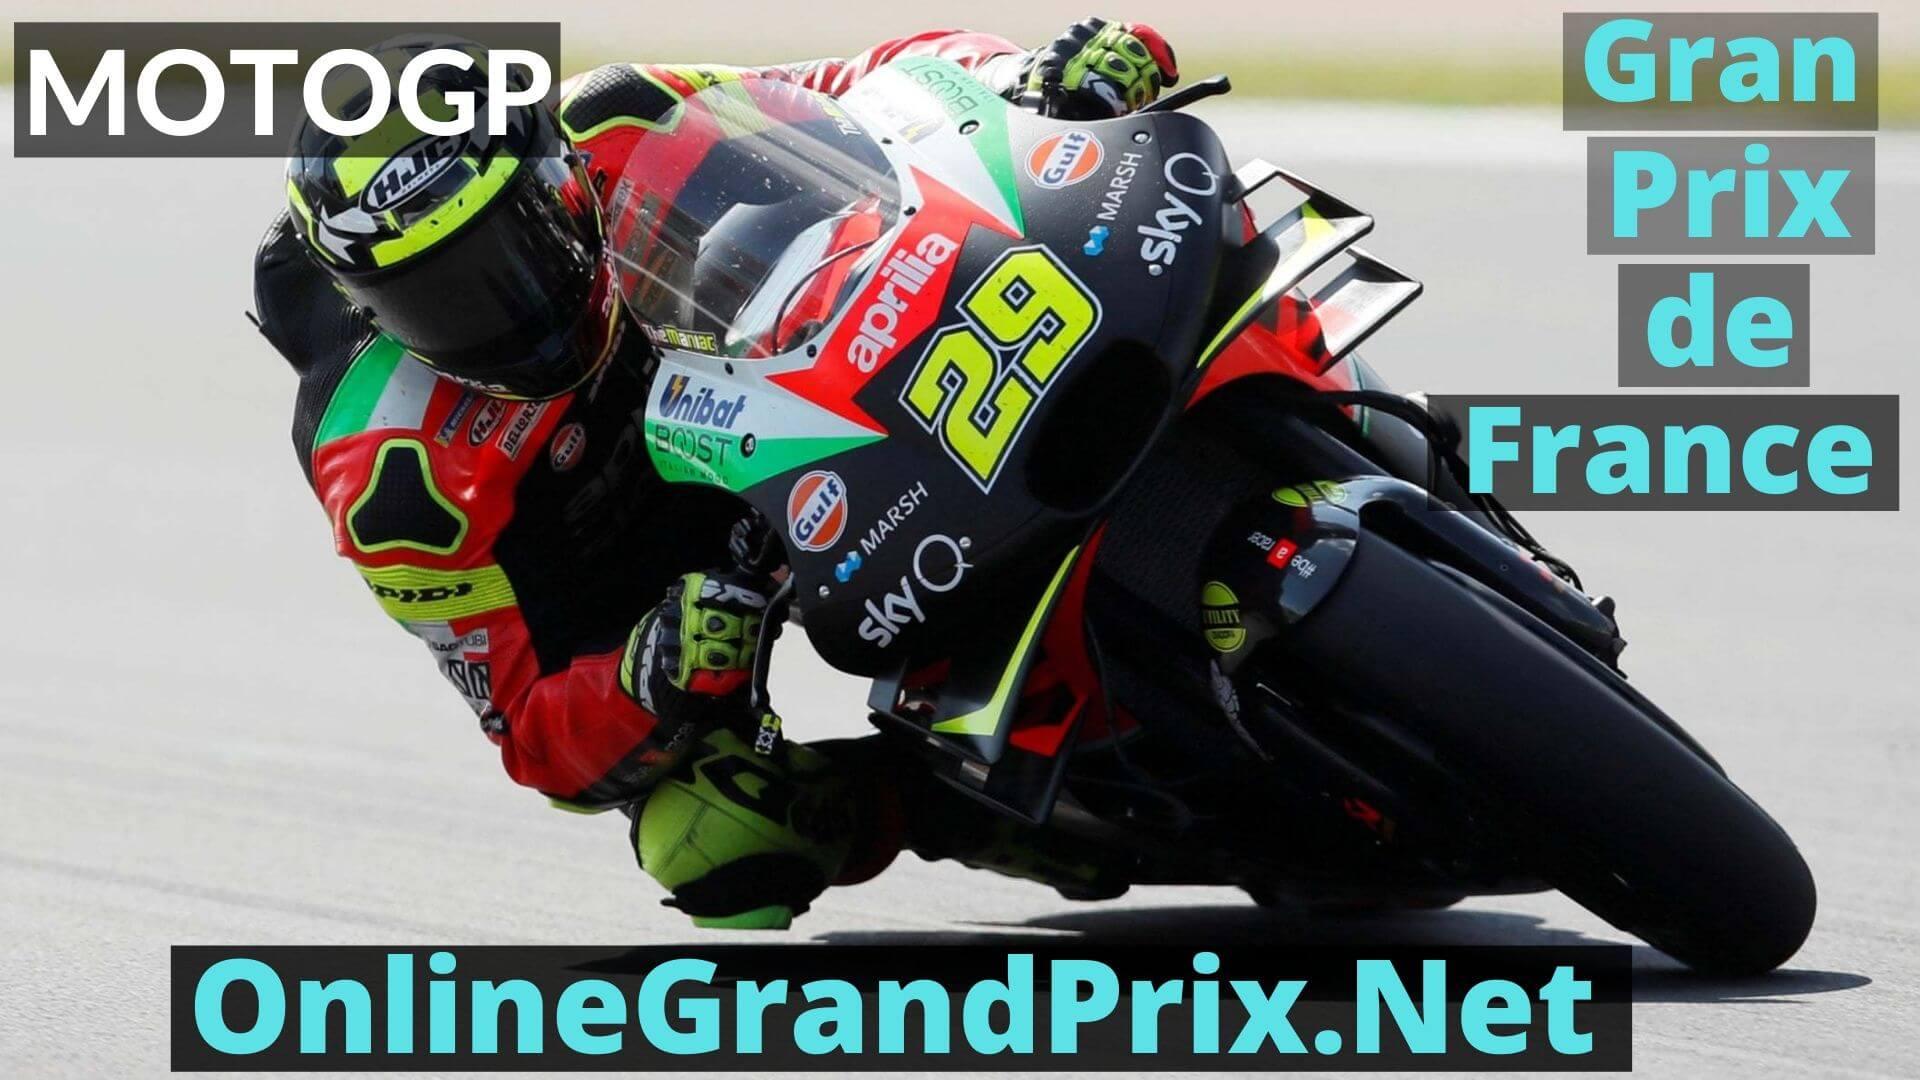 Grand Prix de France Live Stream 2020 | MotoGP